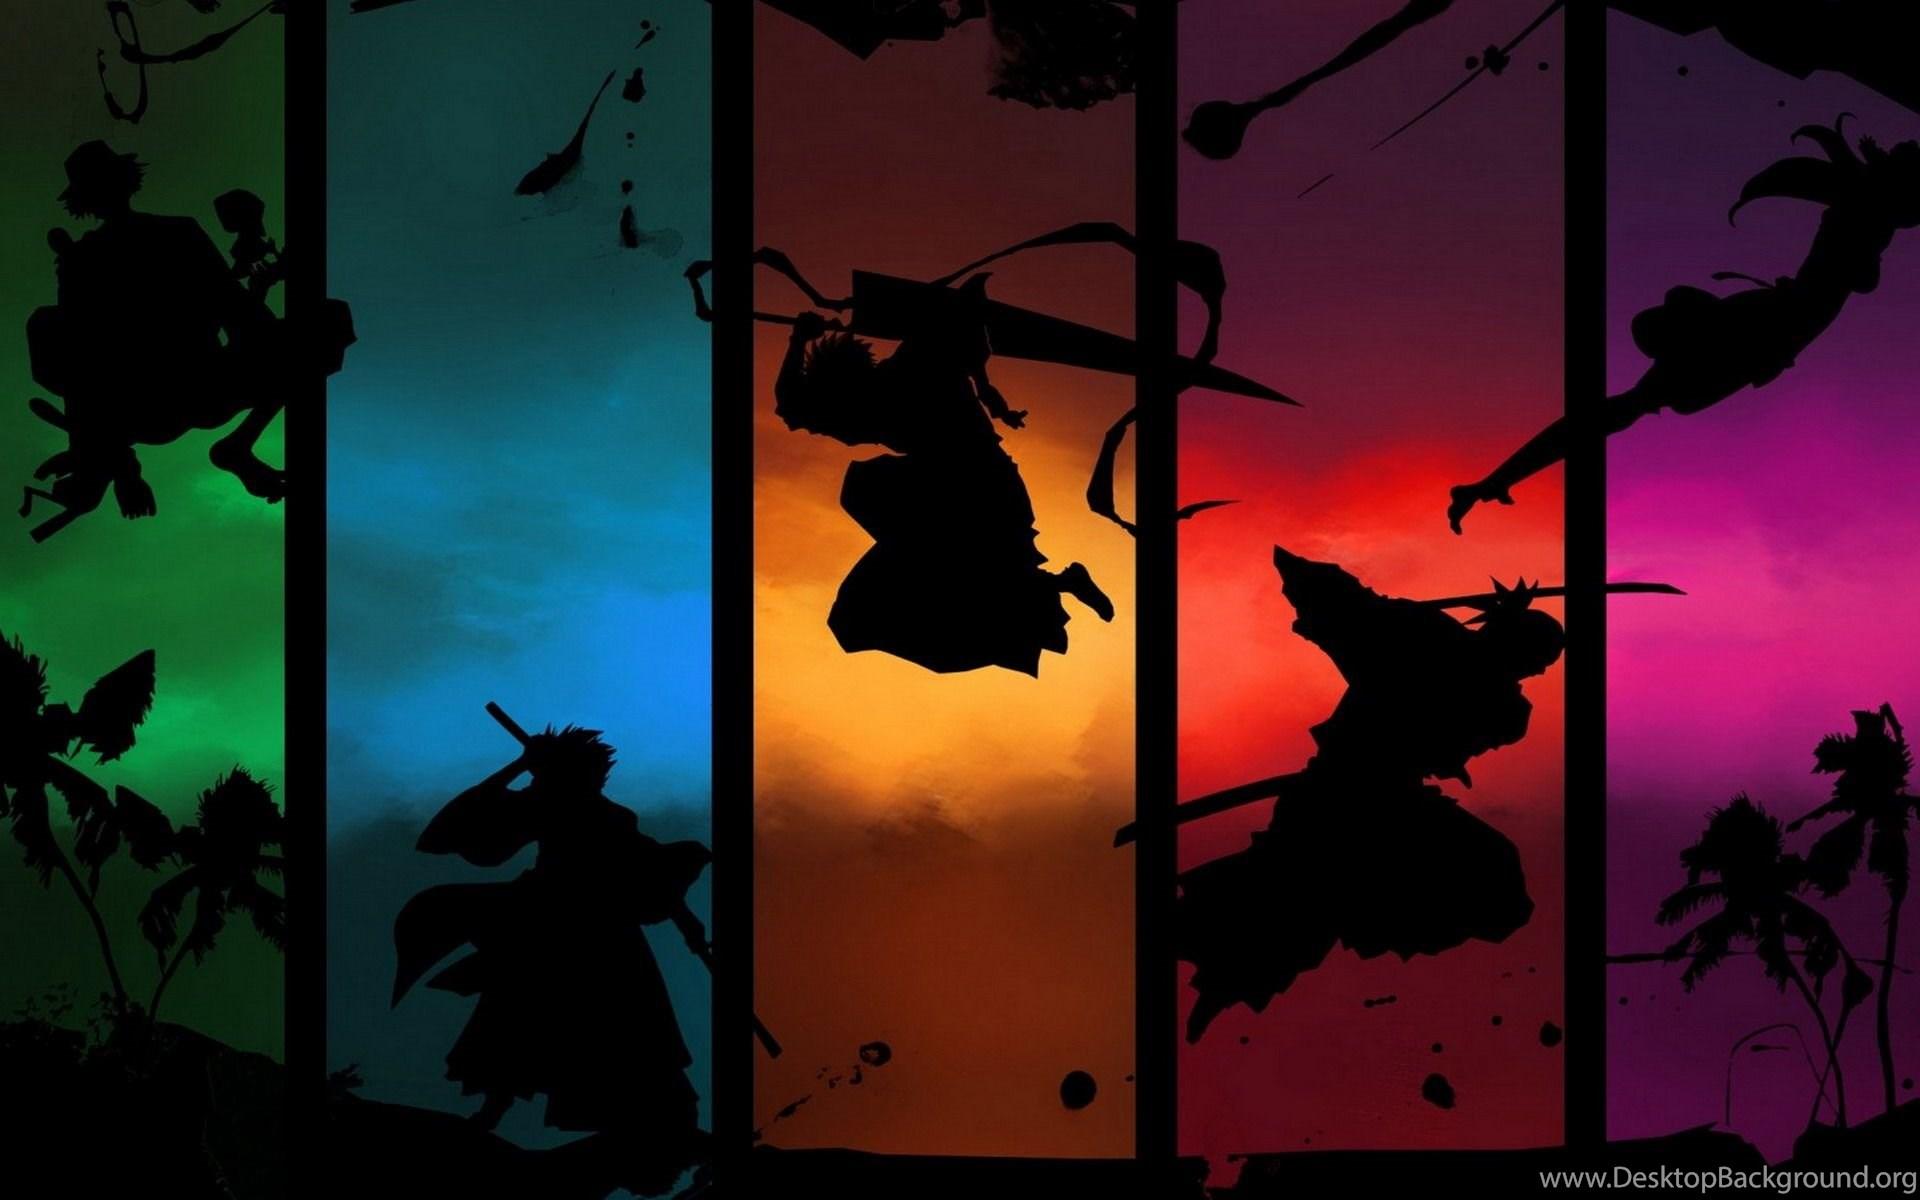 bleach anime hd wallpapers desktop background